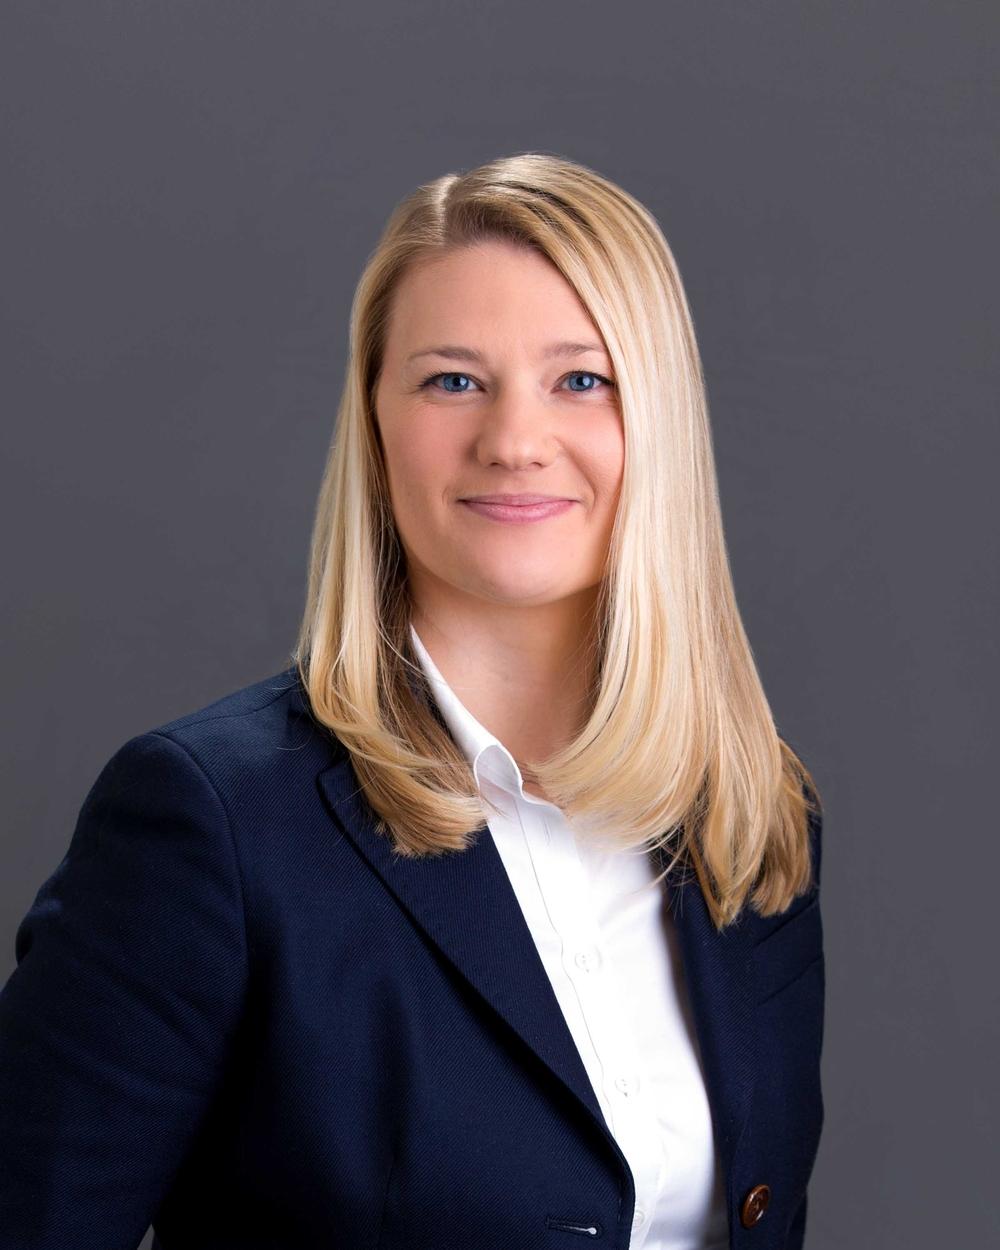 Heidi Ludeman, President